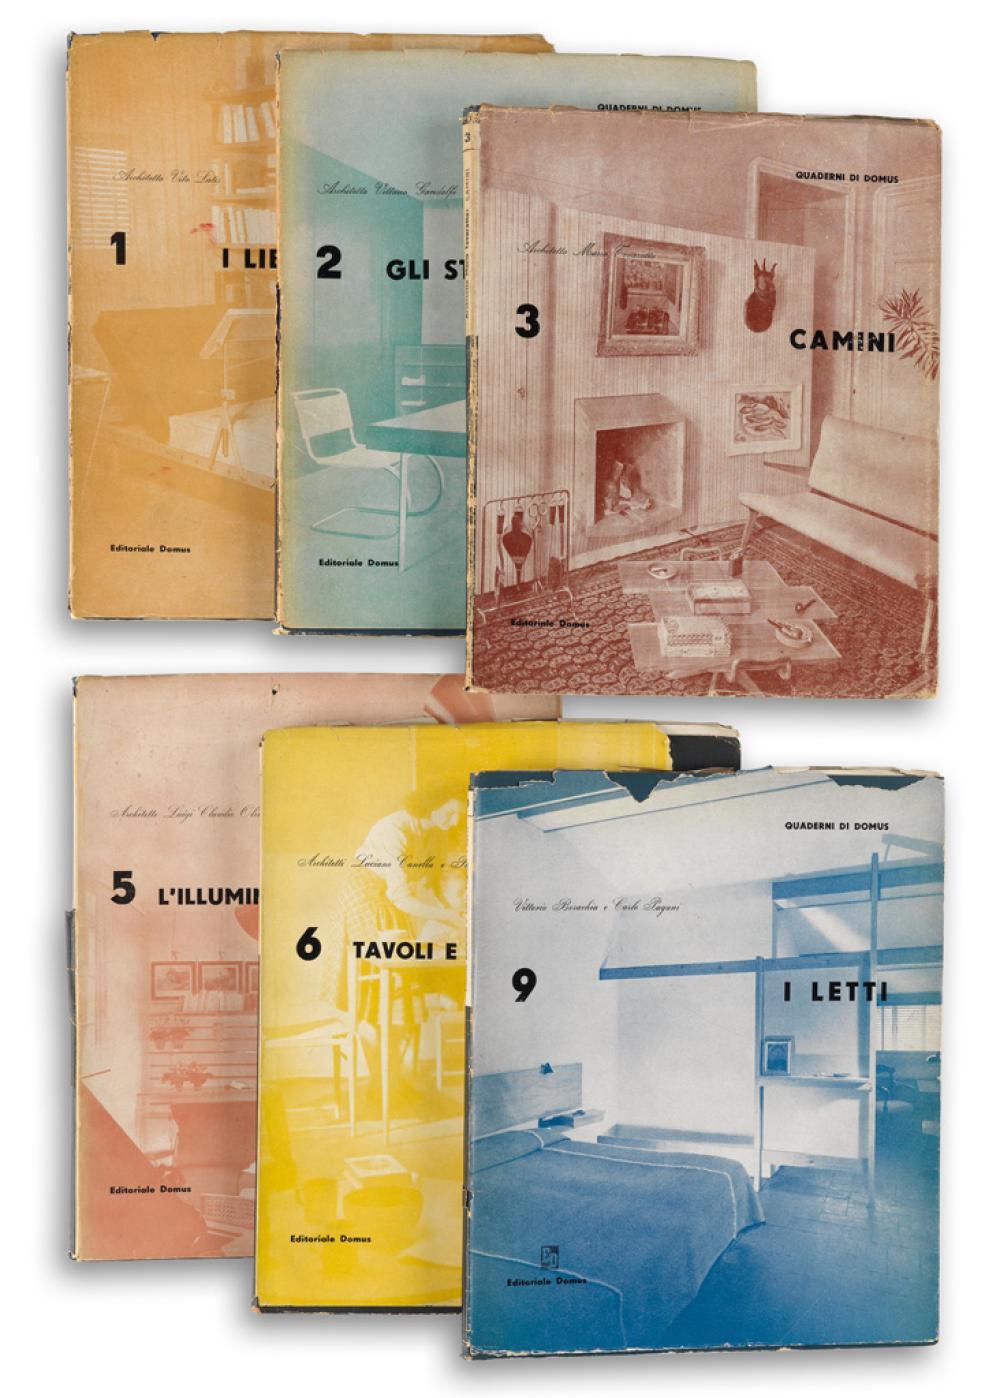 (DESIGN.) Bo, Lina; and Carlo Pagani; editors. Quaderni di Domus. Group of 6 volumes.